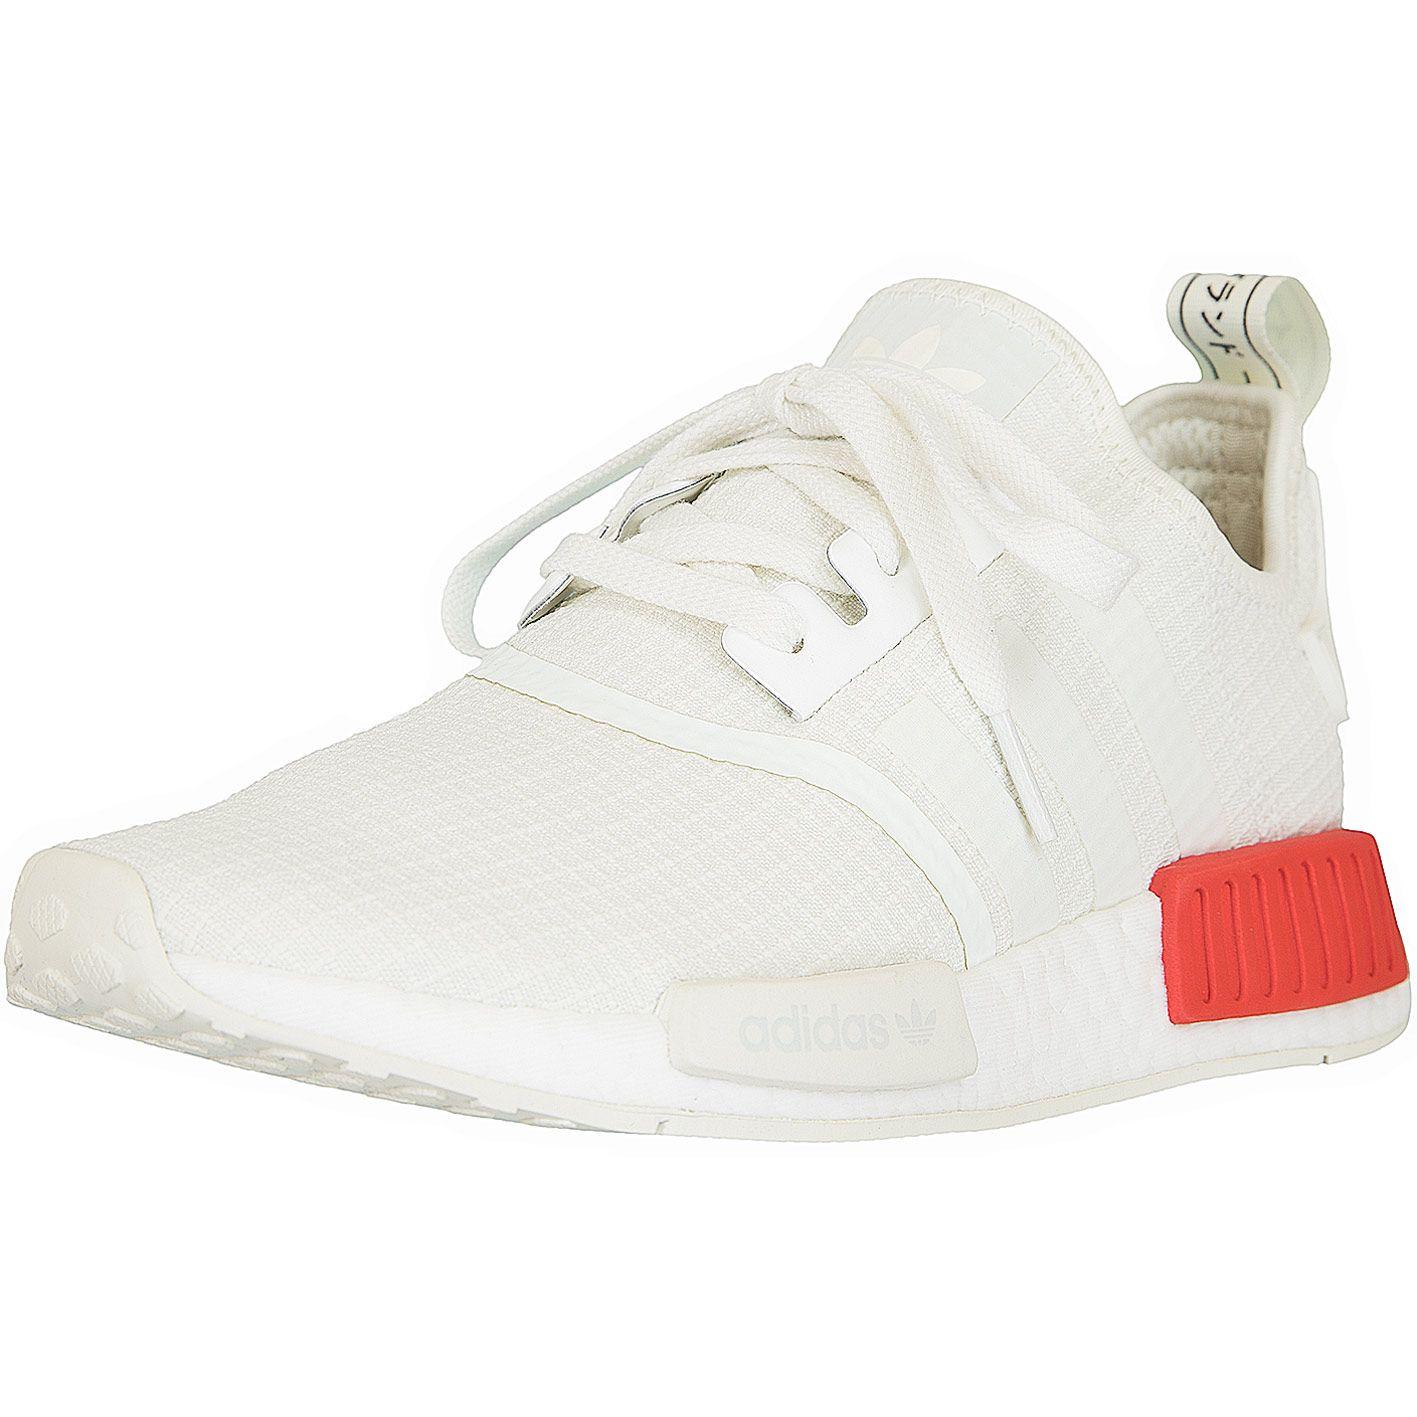 Adidas Originals Sneaker Nmd R1 Weiss Rot Hier Bestellen Adidas Originals Sneaker Adidas Originals Sneaker